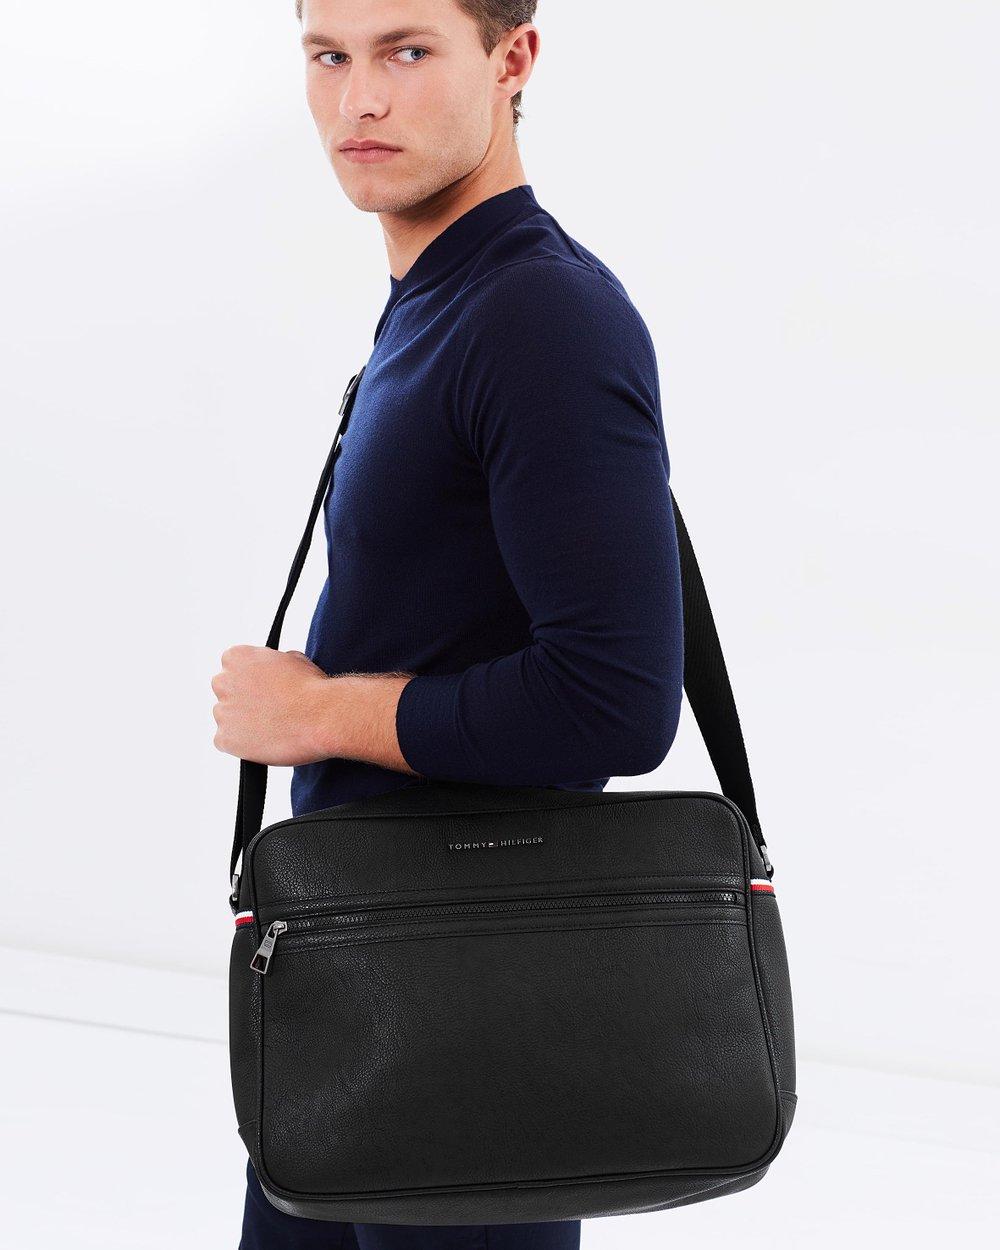 5ec5a7367e Essential Messenger Bag by Tommy Hilfiger Online